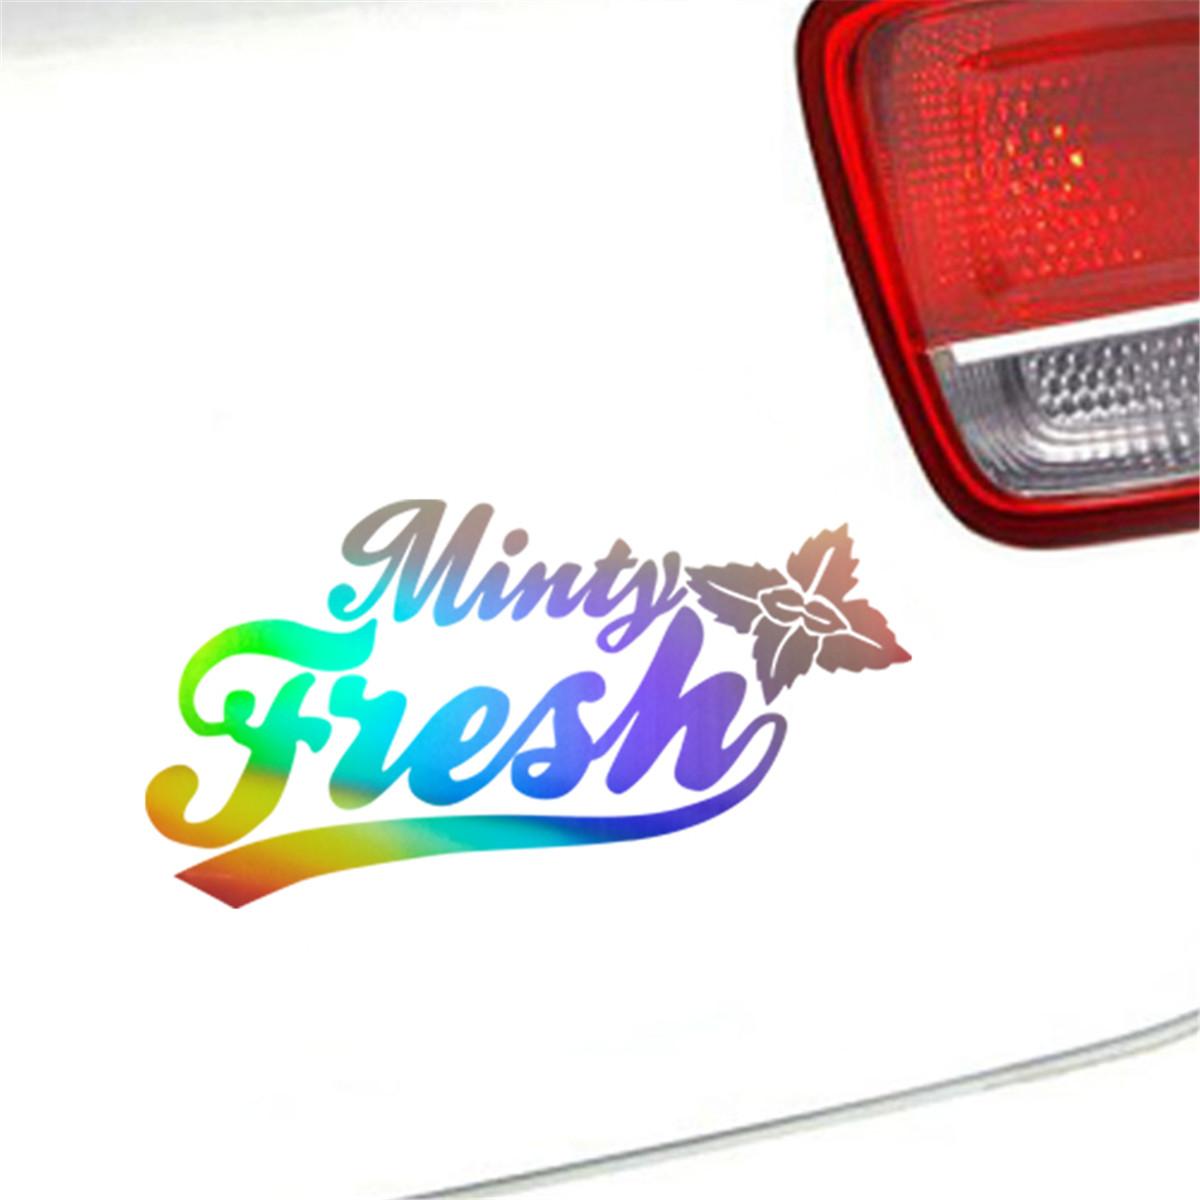 Details about minty fresh funny sticker car bumper window door laptop wall decor vinyl decal